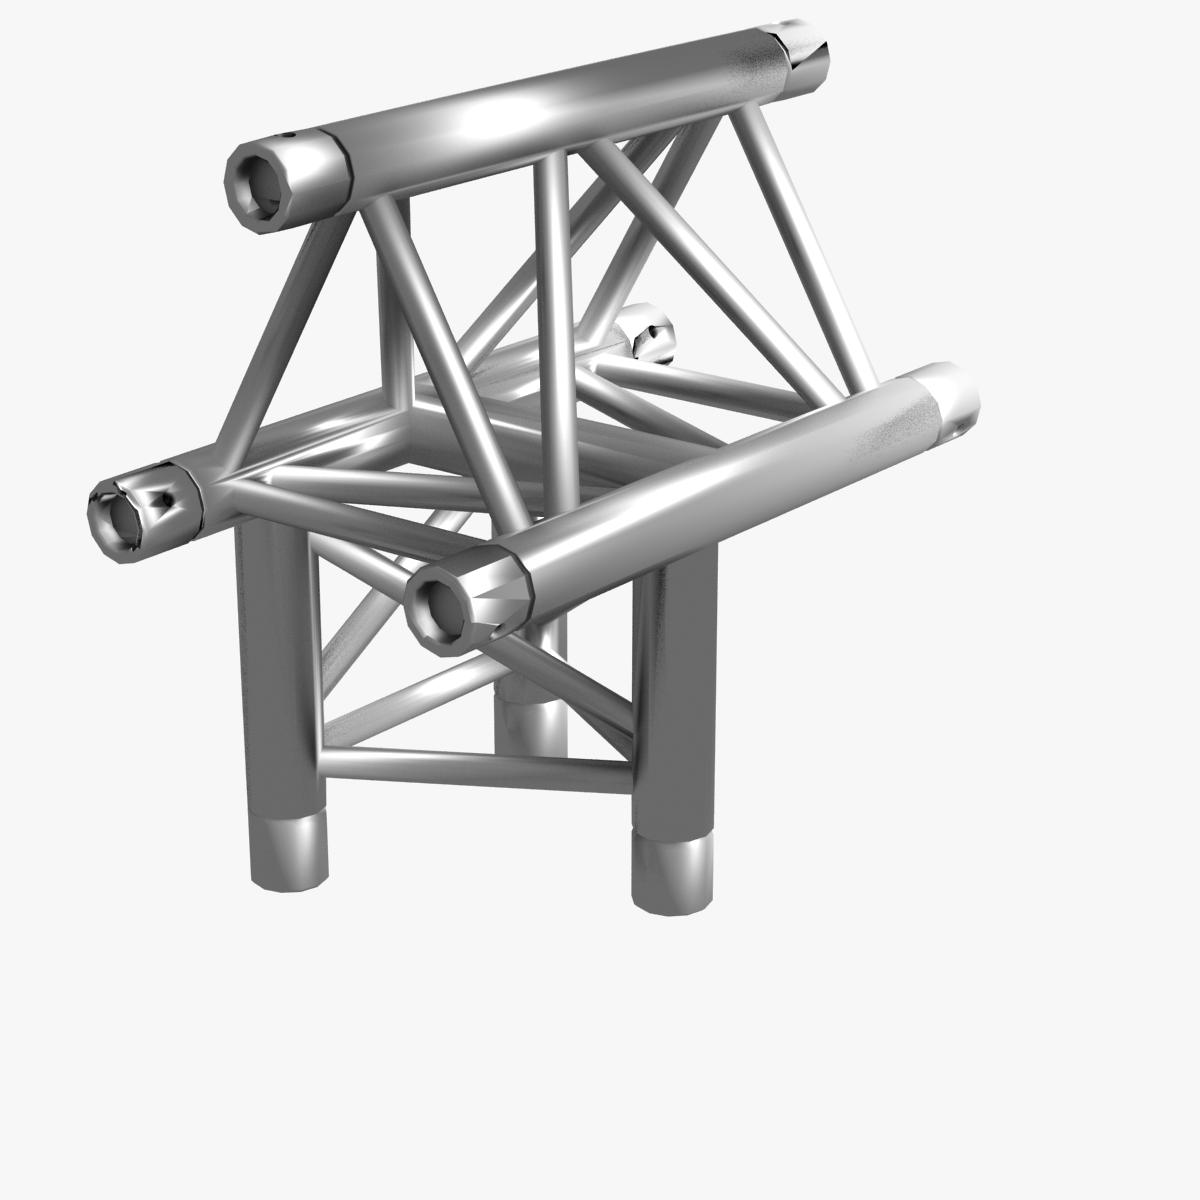 triangular trusses (collection 55 modular pieces) 3d model 3ds max dxf fbx c4d dae texture obj 216218